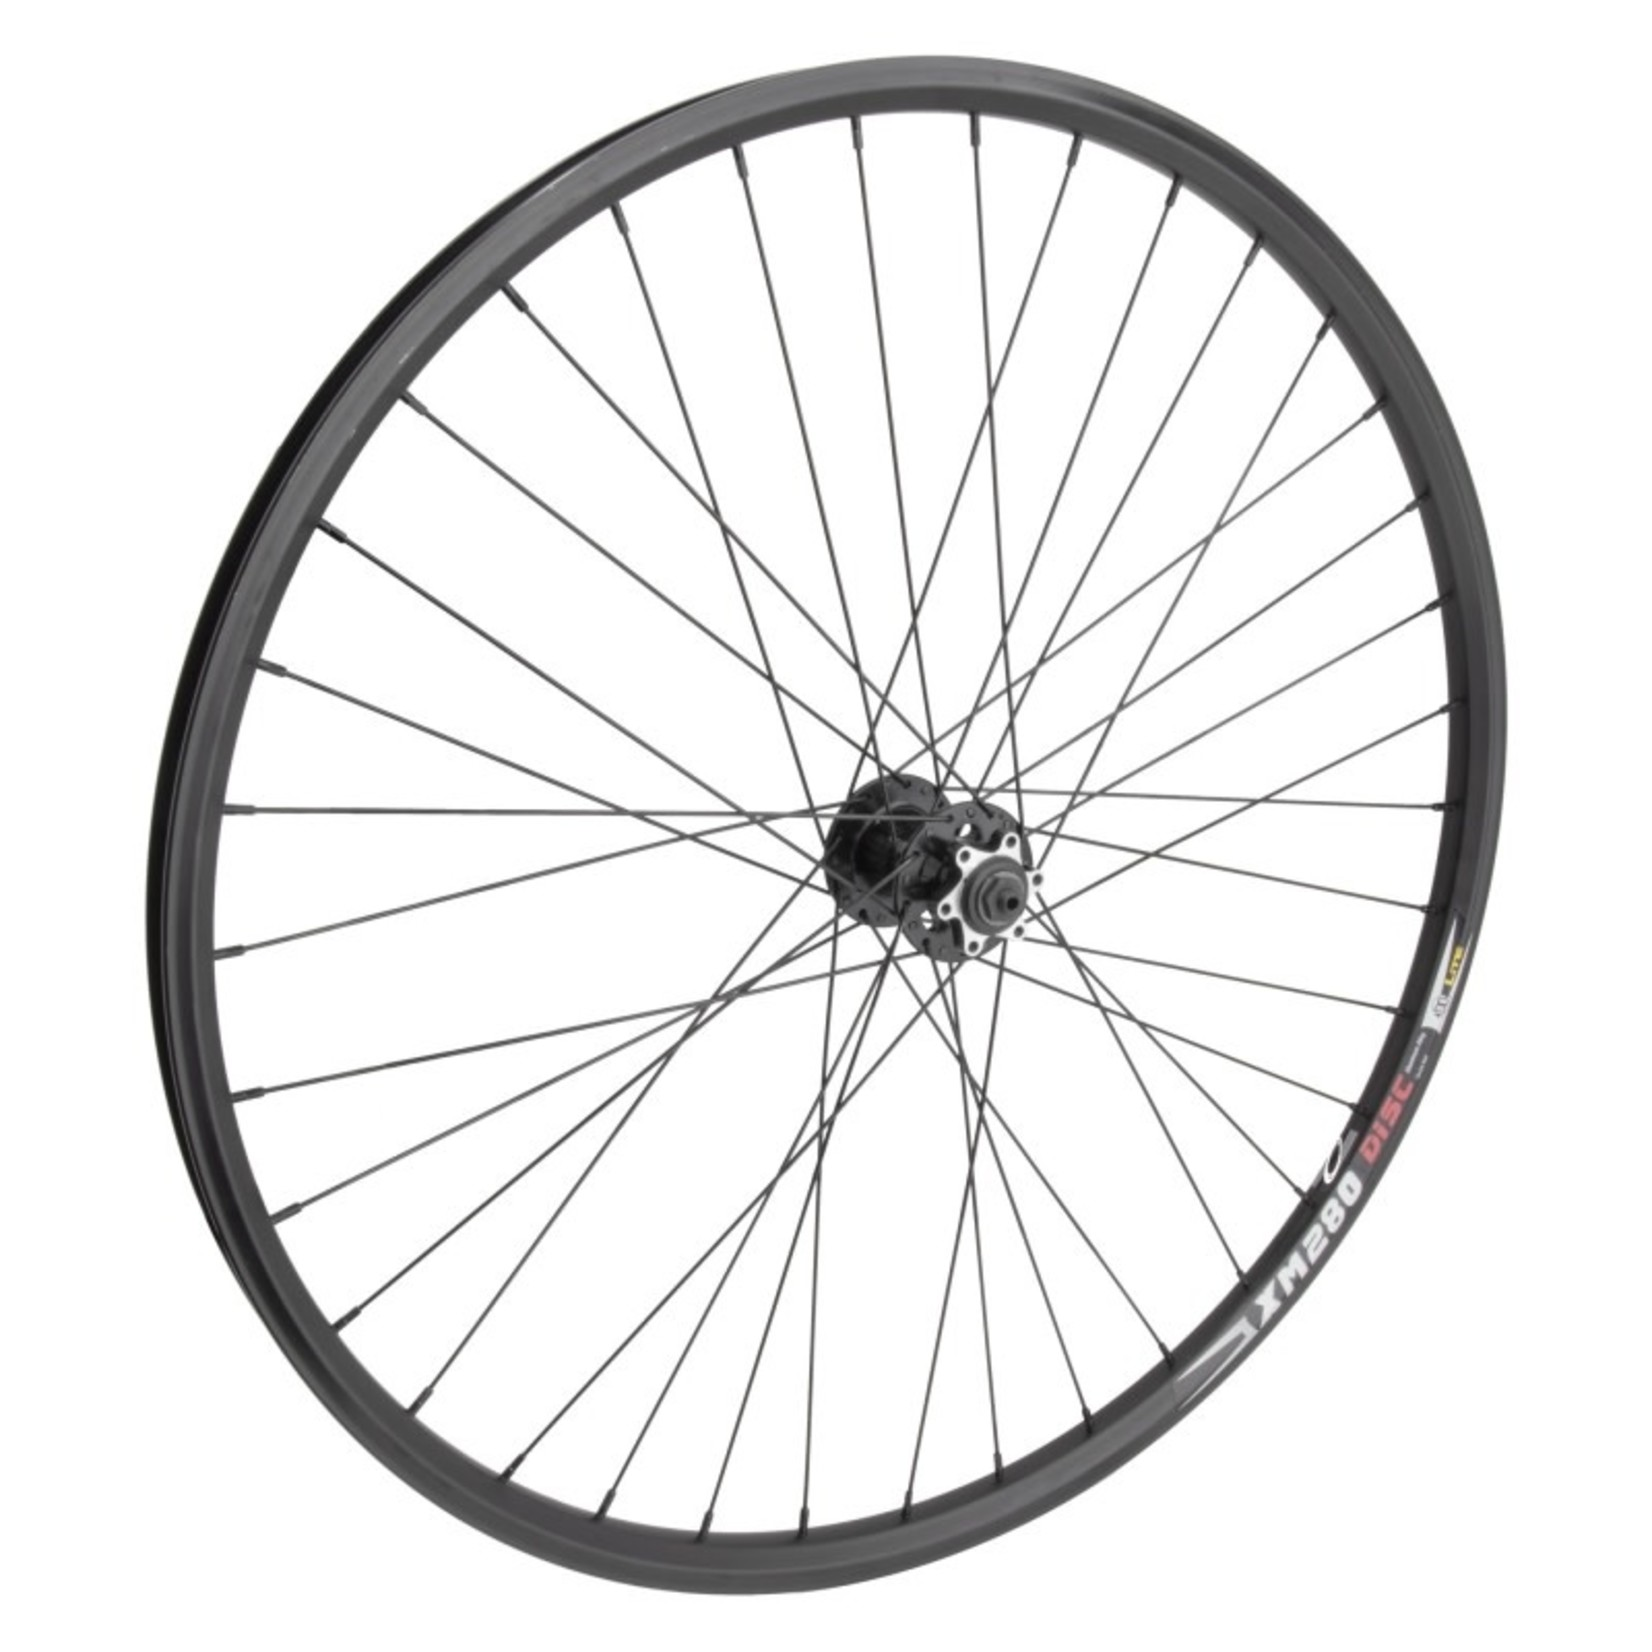 "29"" Front Wheel Alloy Mountain Disc Double Wall Disc Brake QR Black"